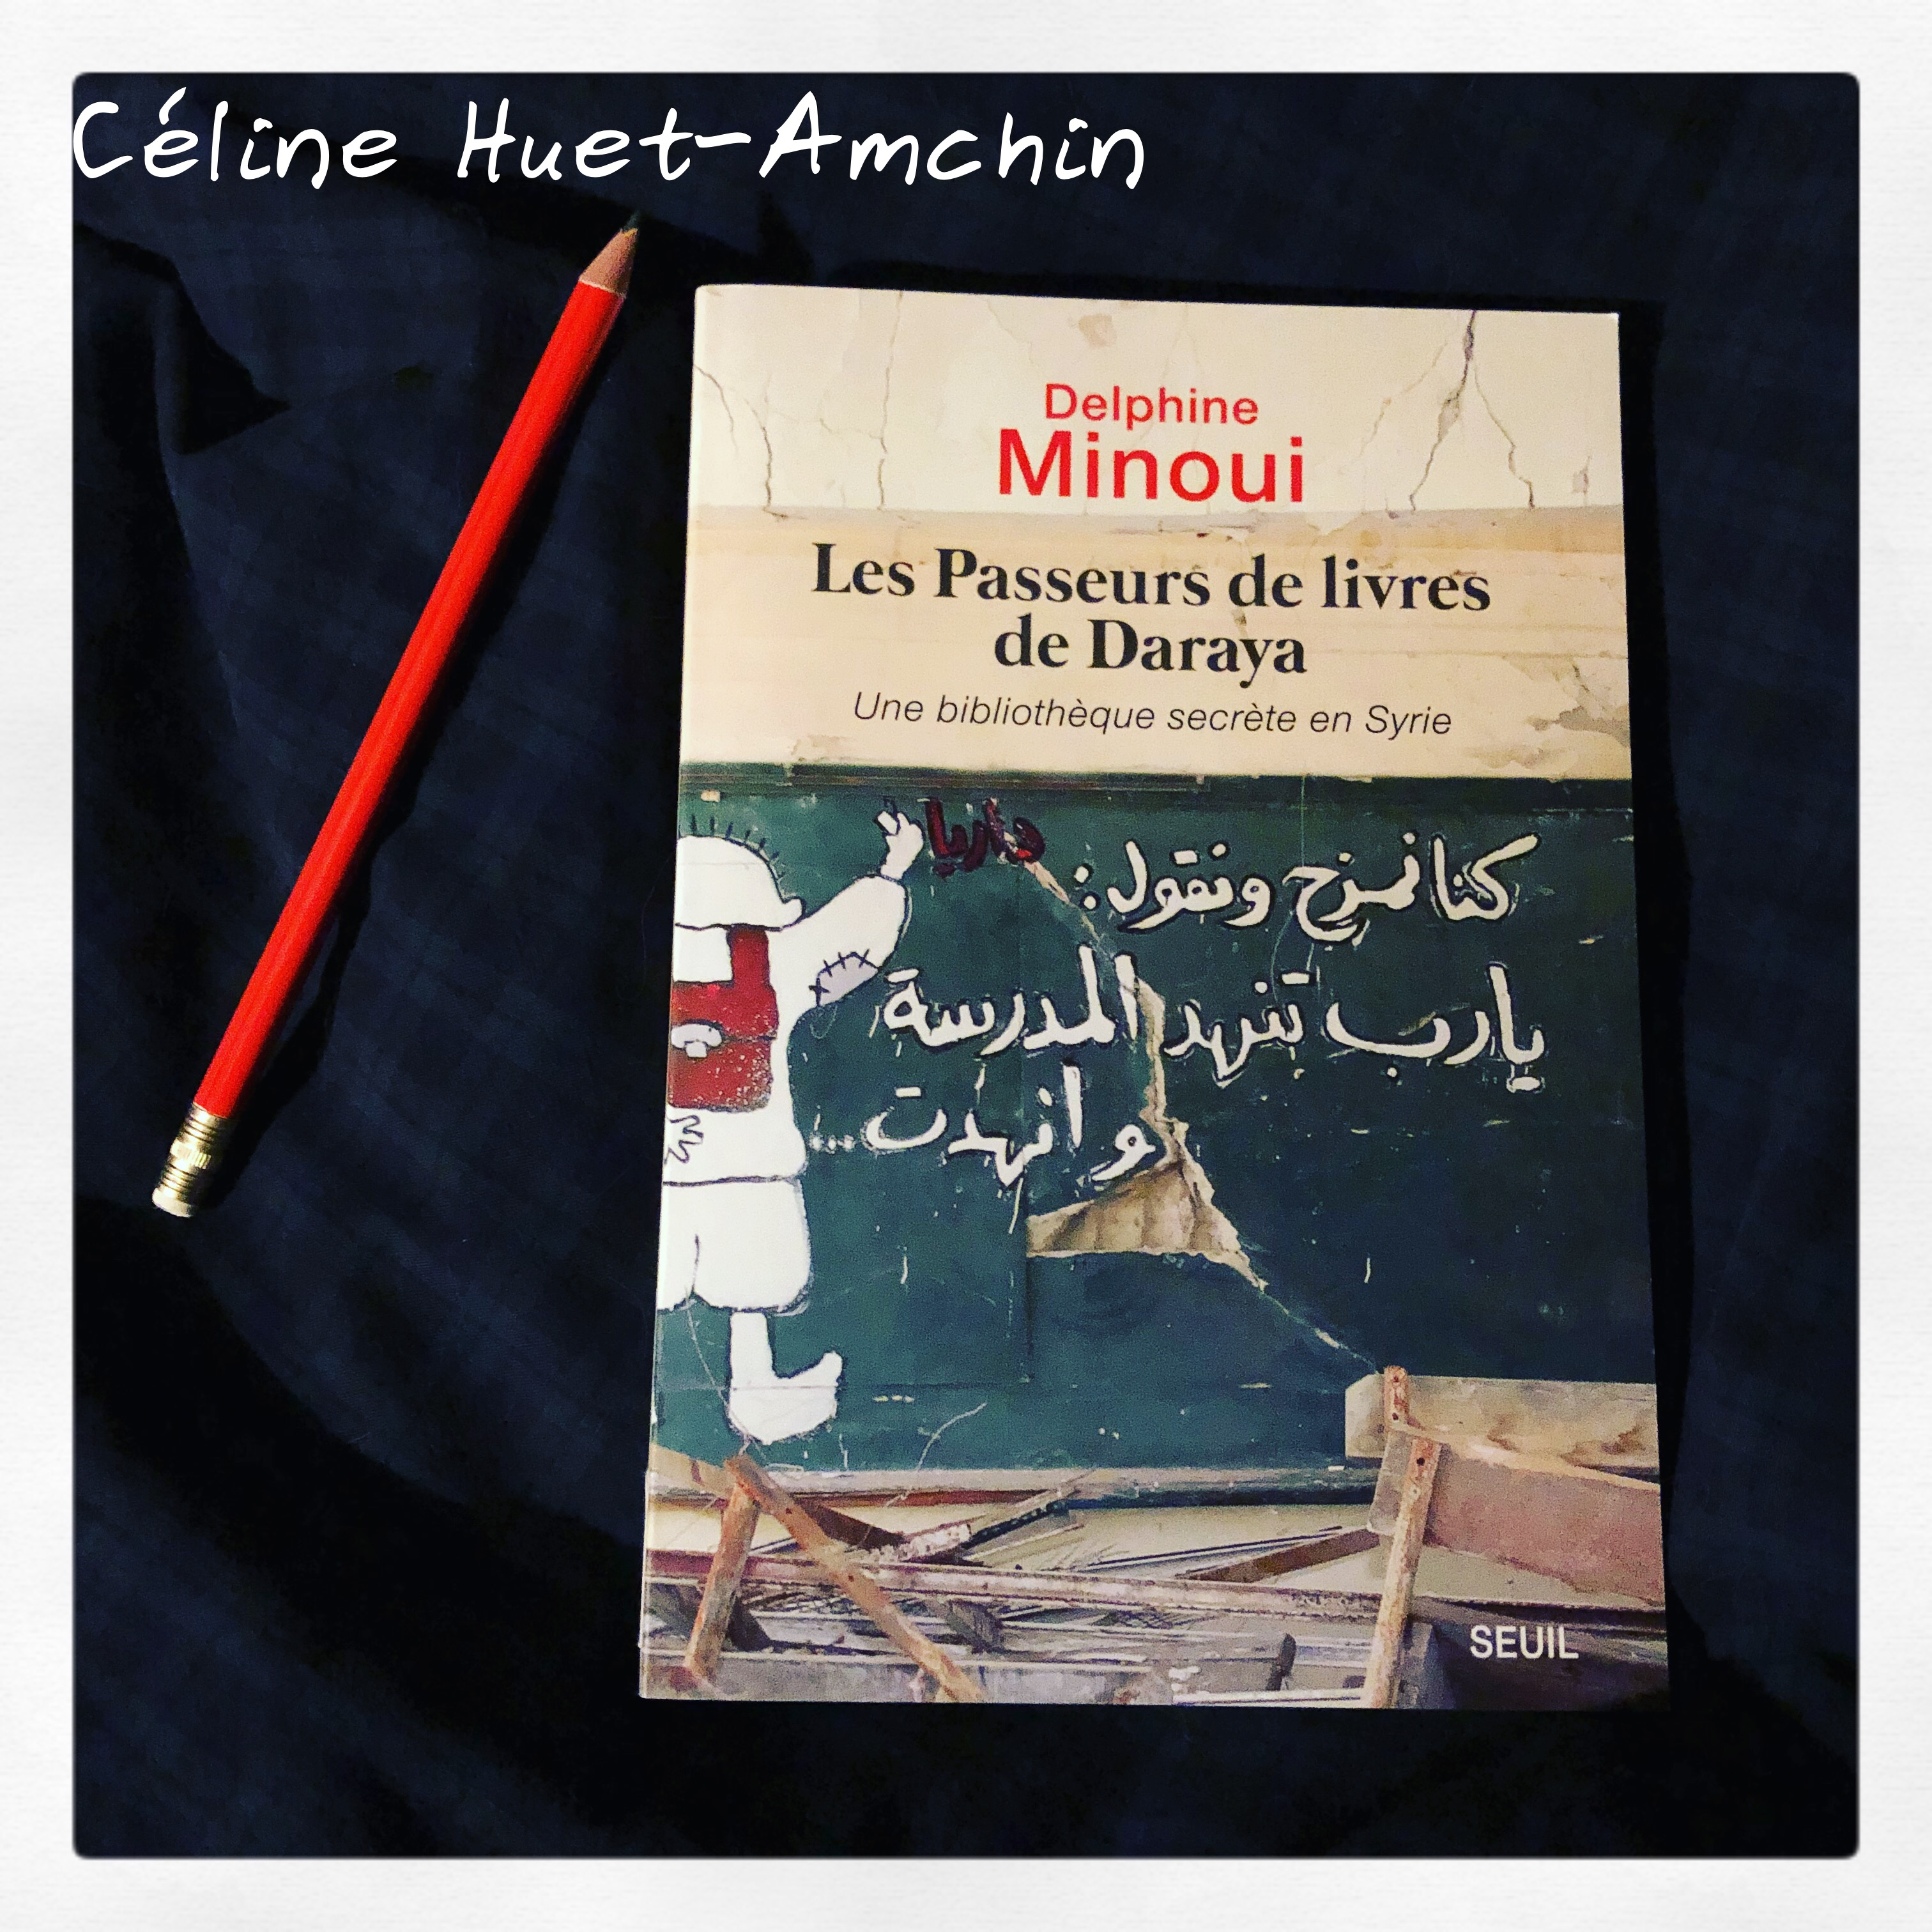 Les passeurs de livres de Daraya Delphine Minoui Editions Seuil